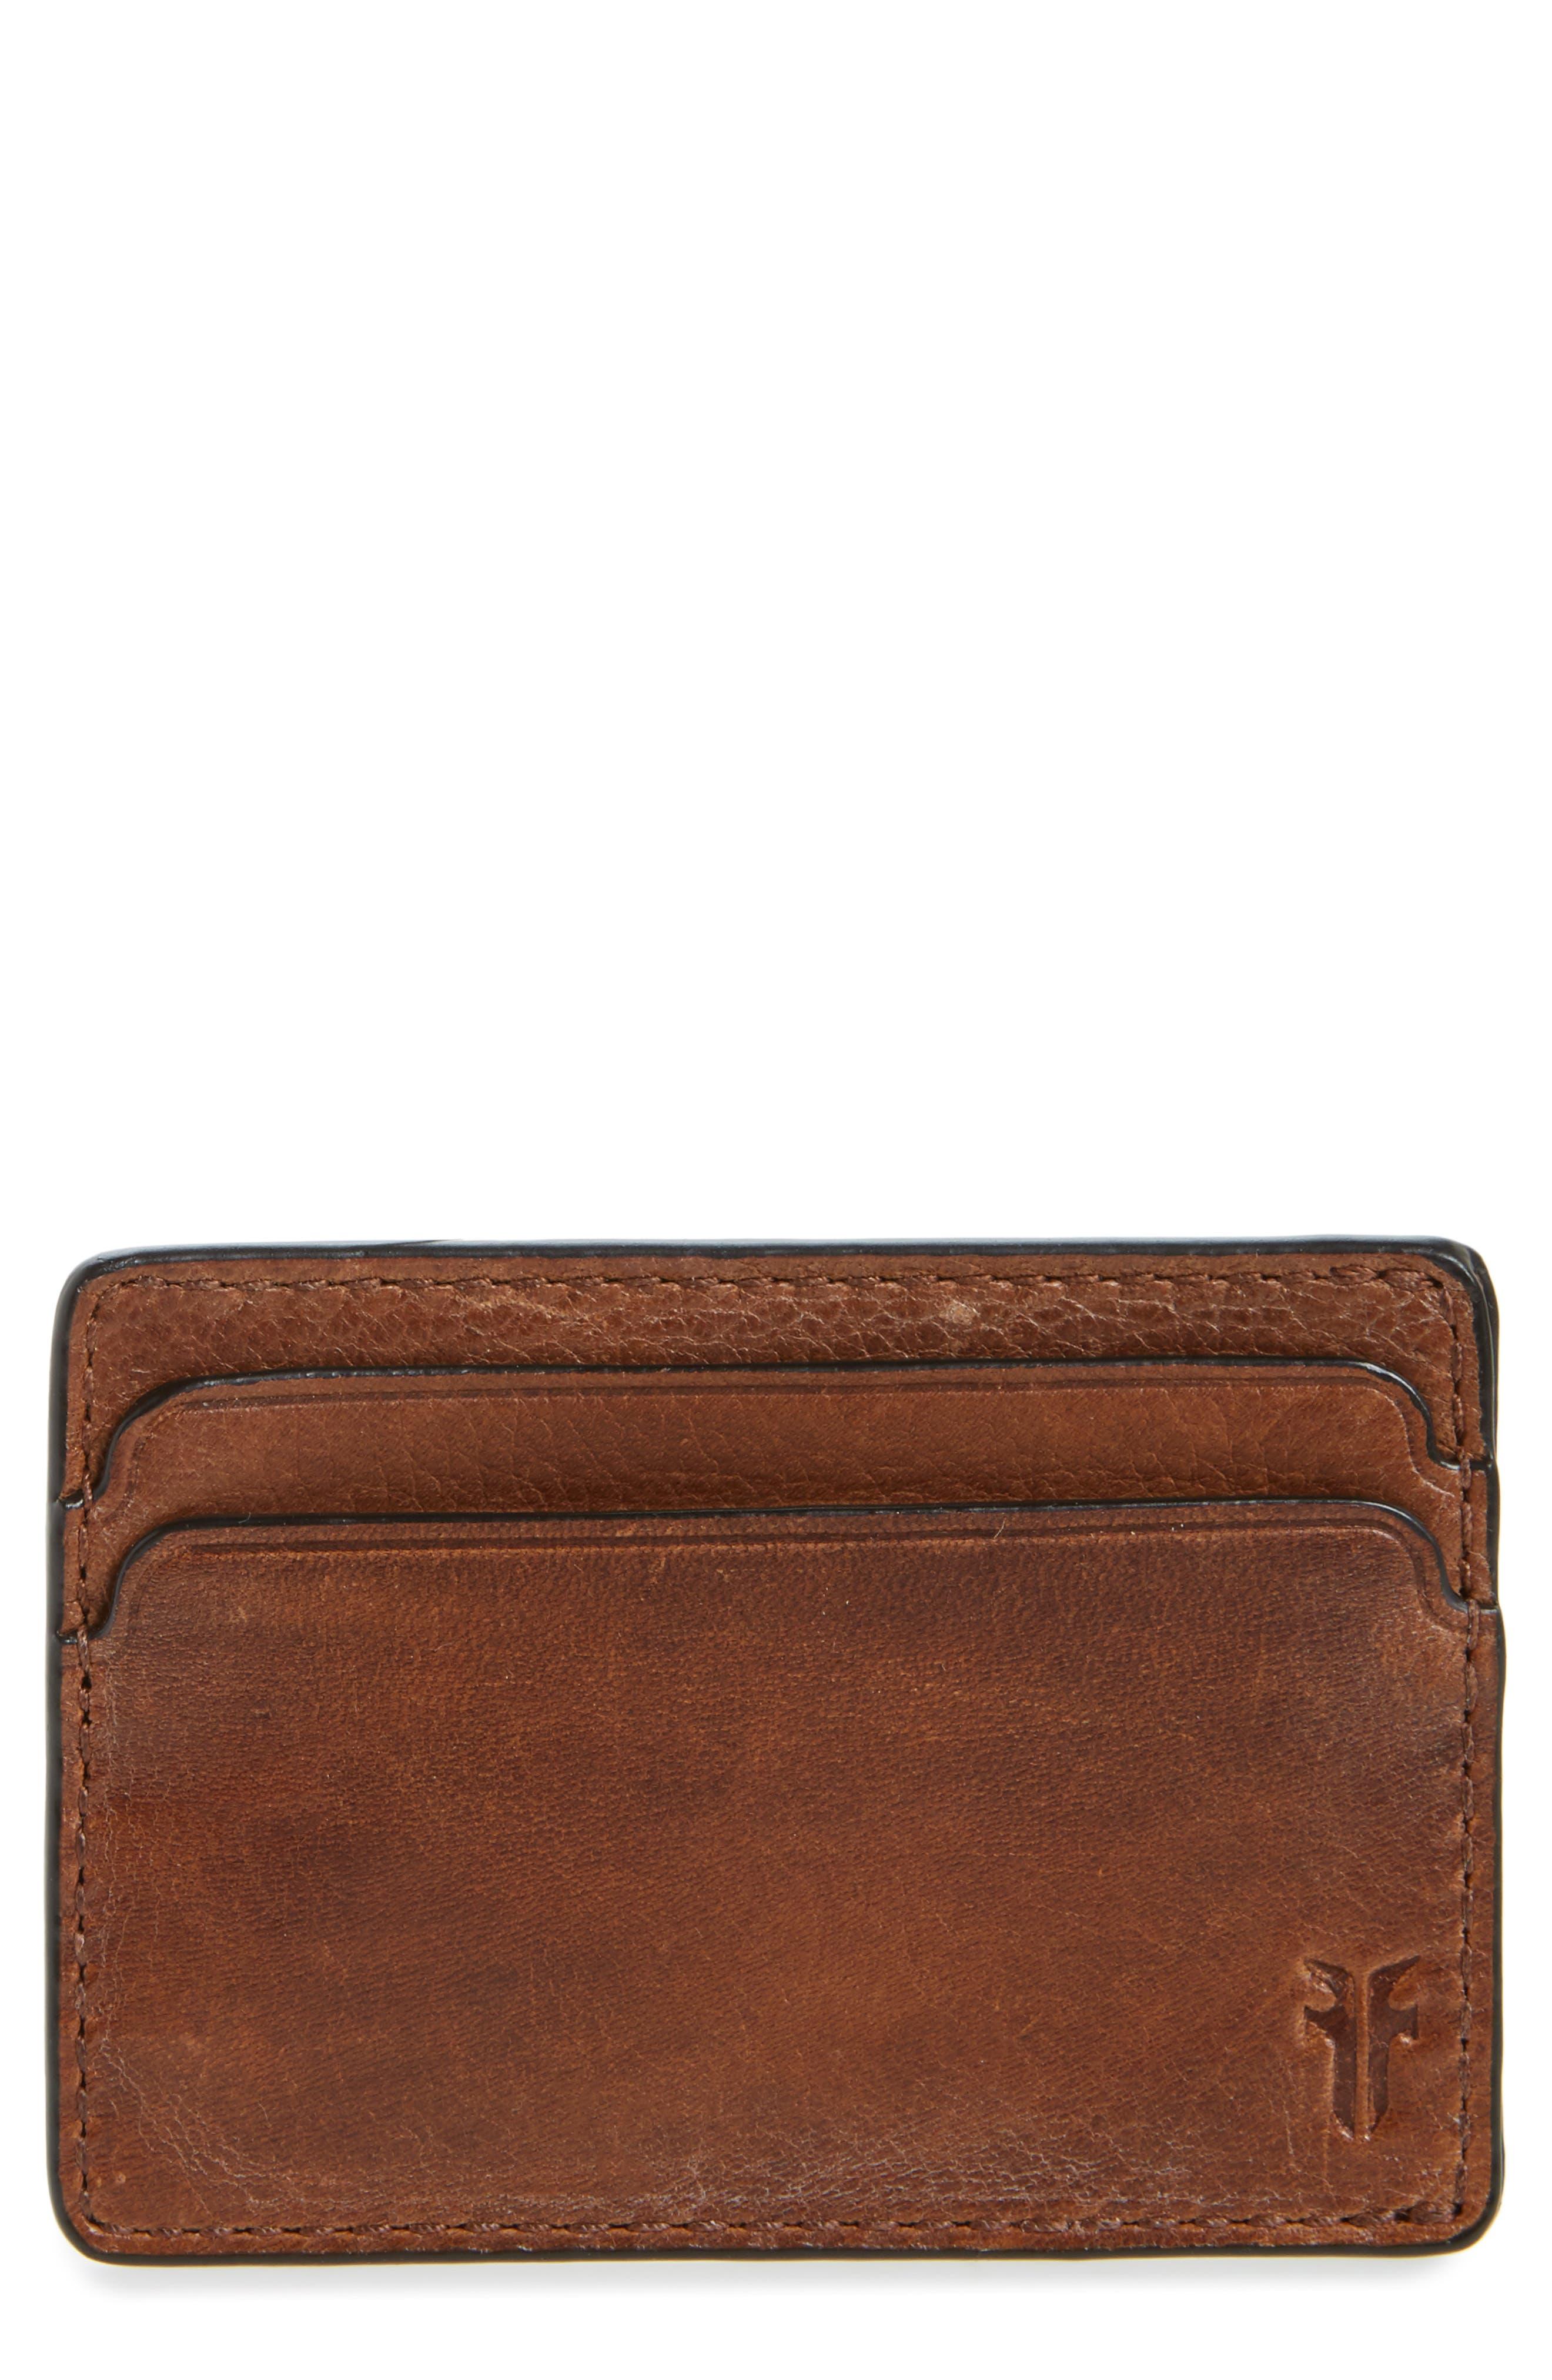 Oliver Leather Card Case,                         Main,                         color, Cognac